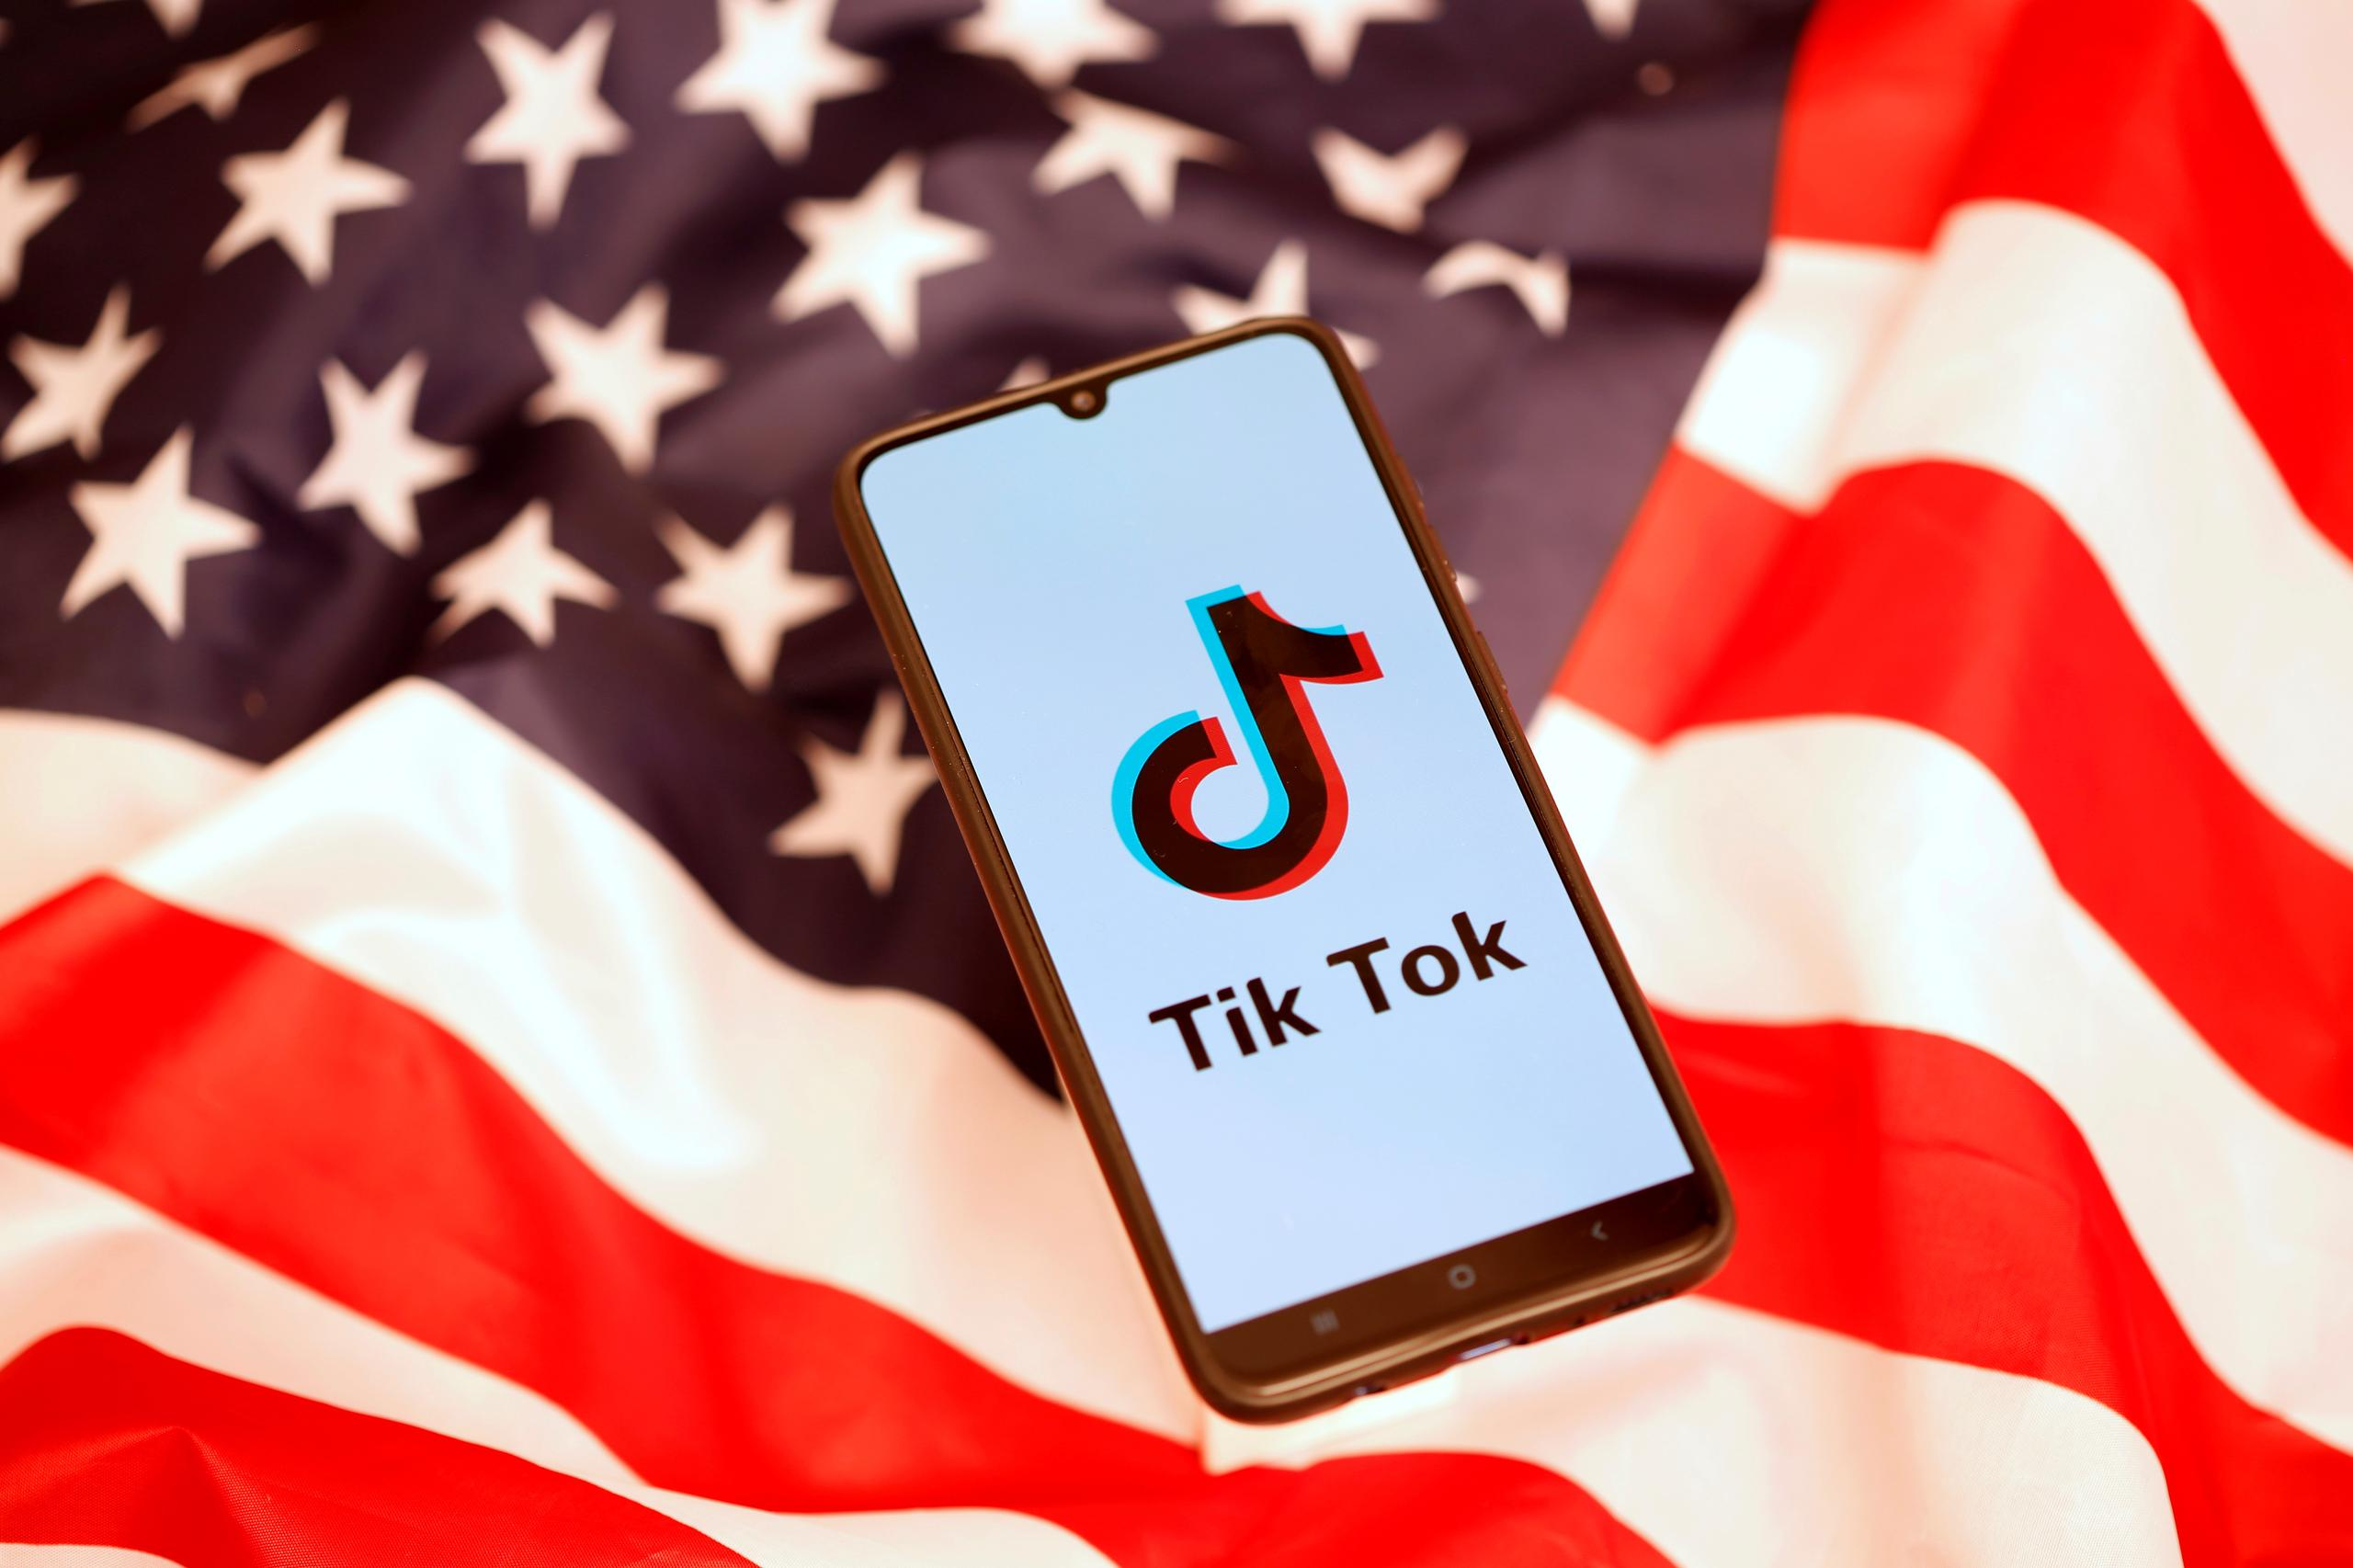 Trump orders ByteDance to divest interest in U.S. TikTok operations within 90 days